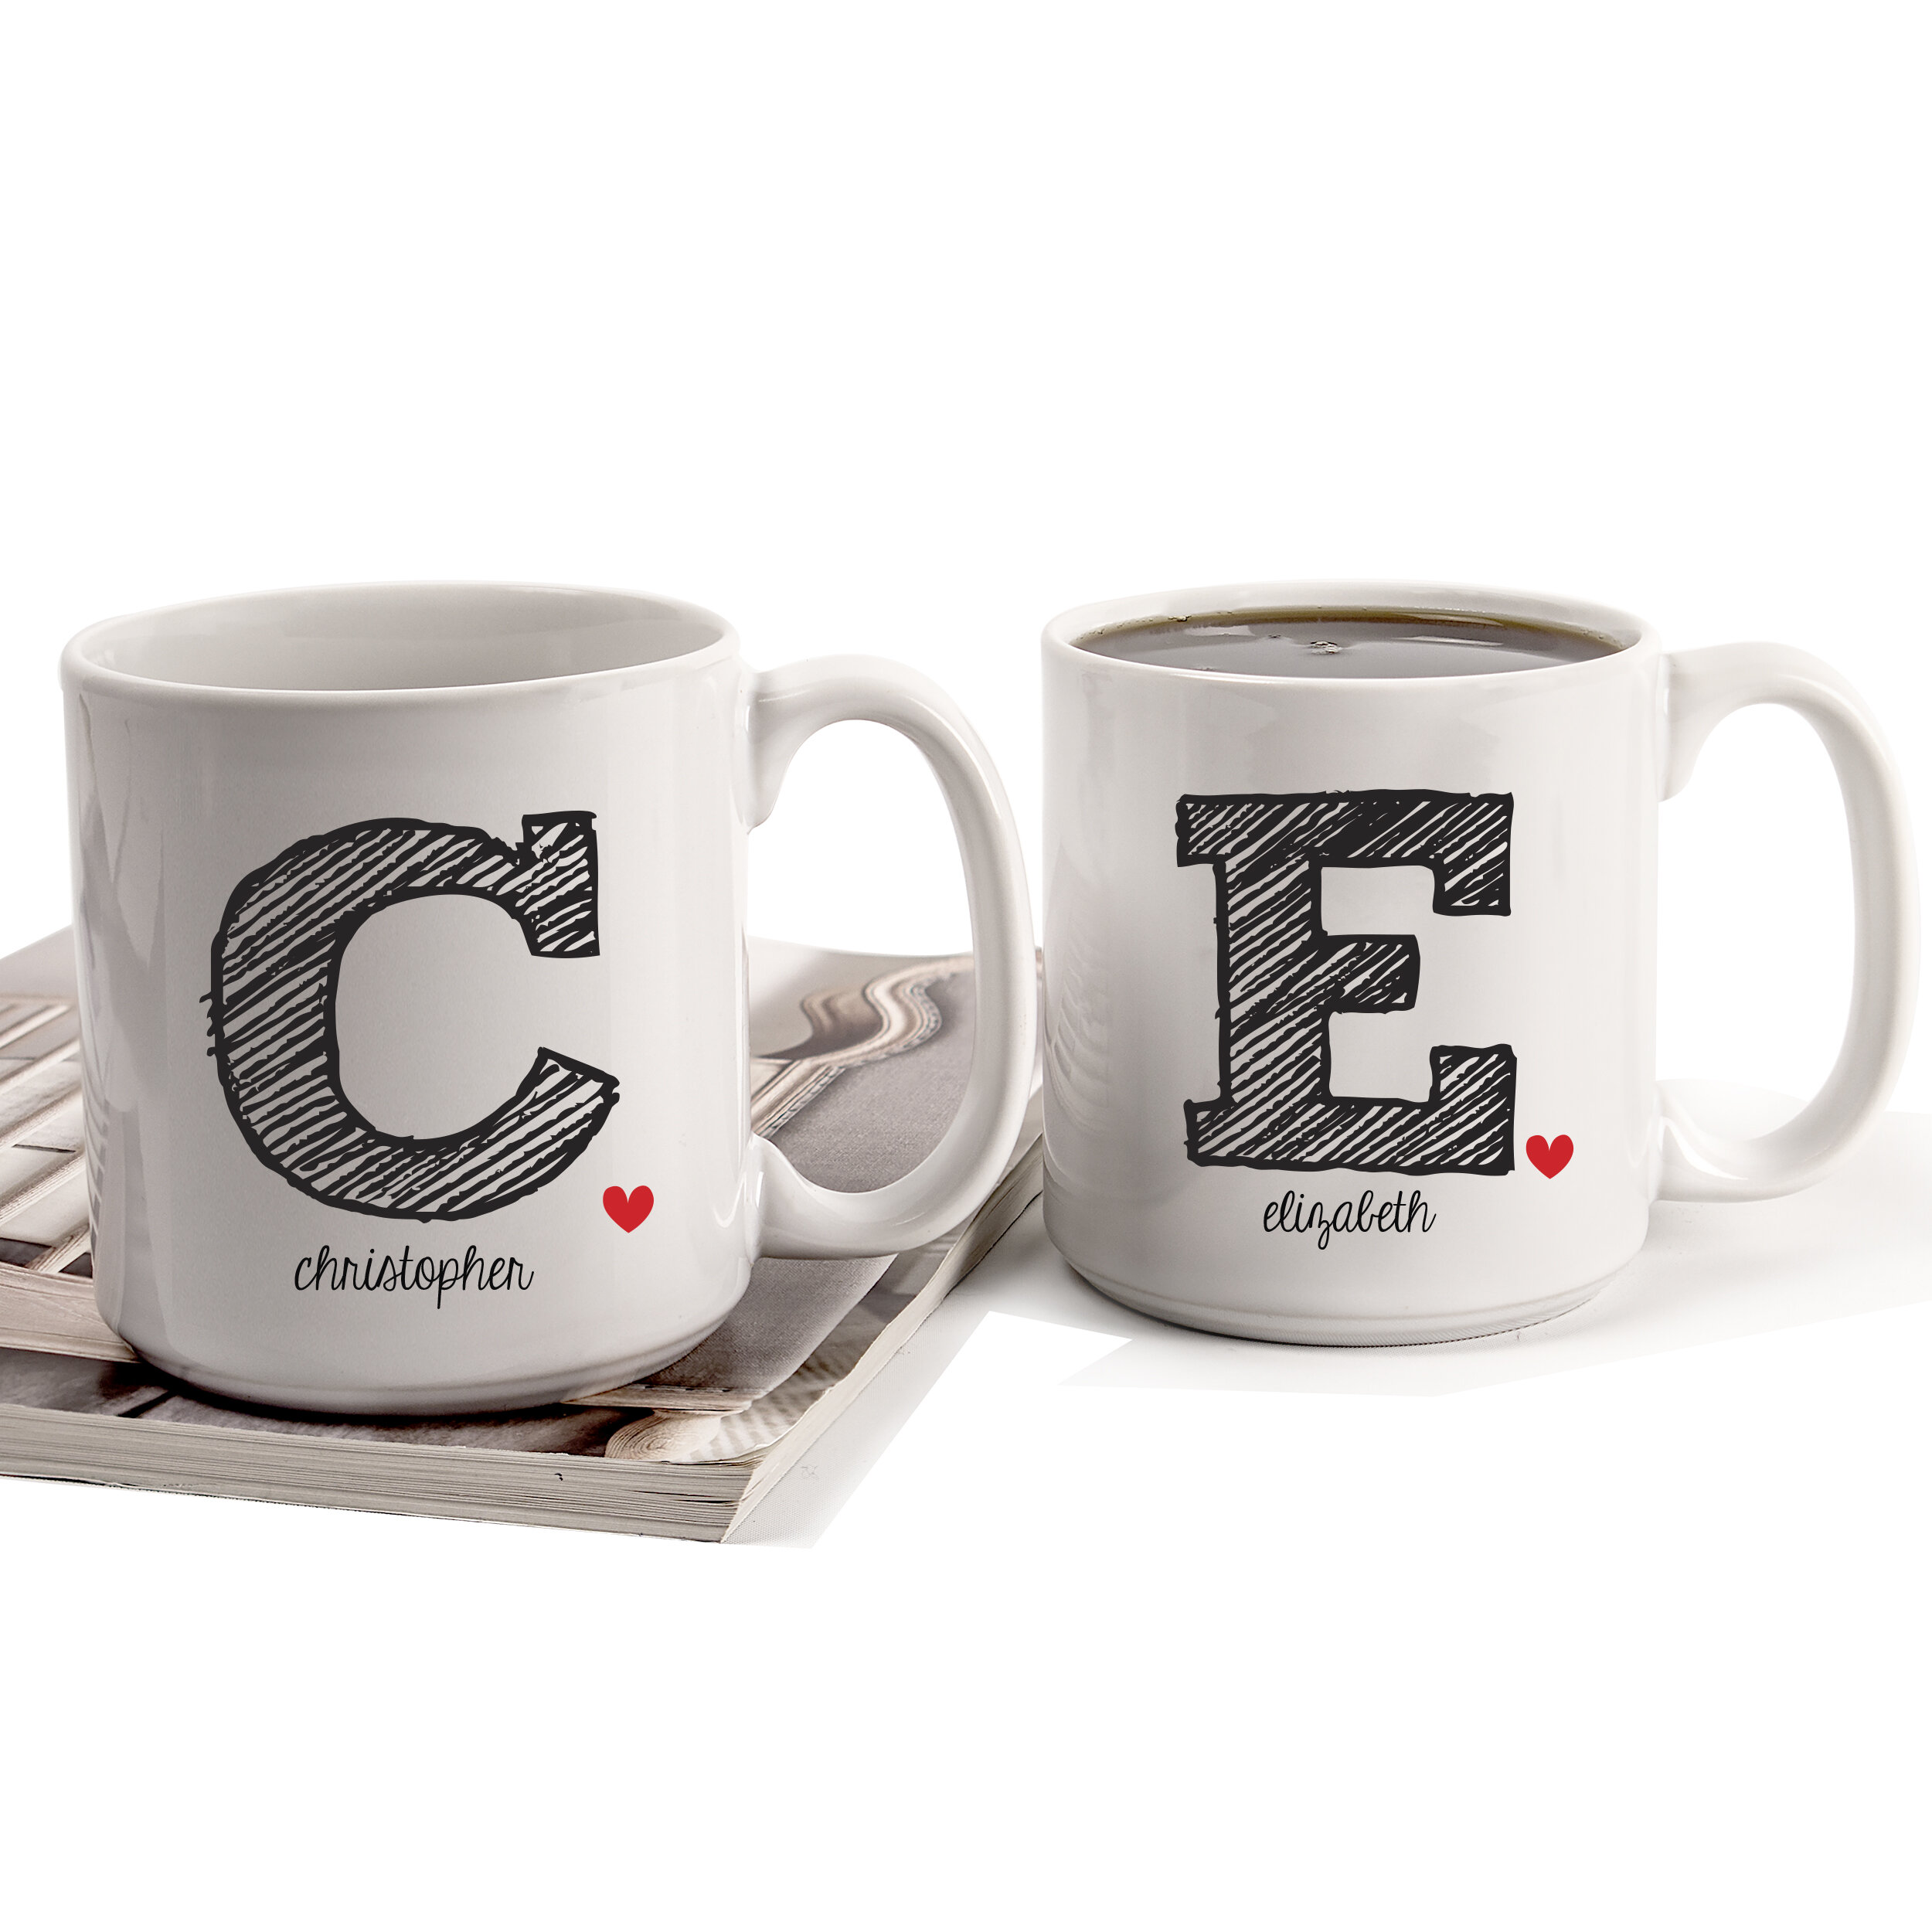 Oversized Mugs Teacups You Ll Love In 2021 Wayfair